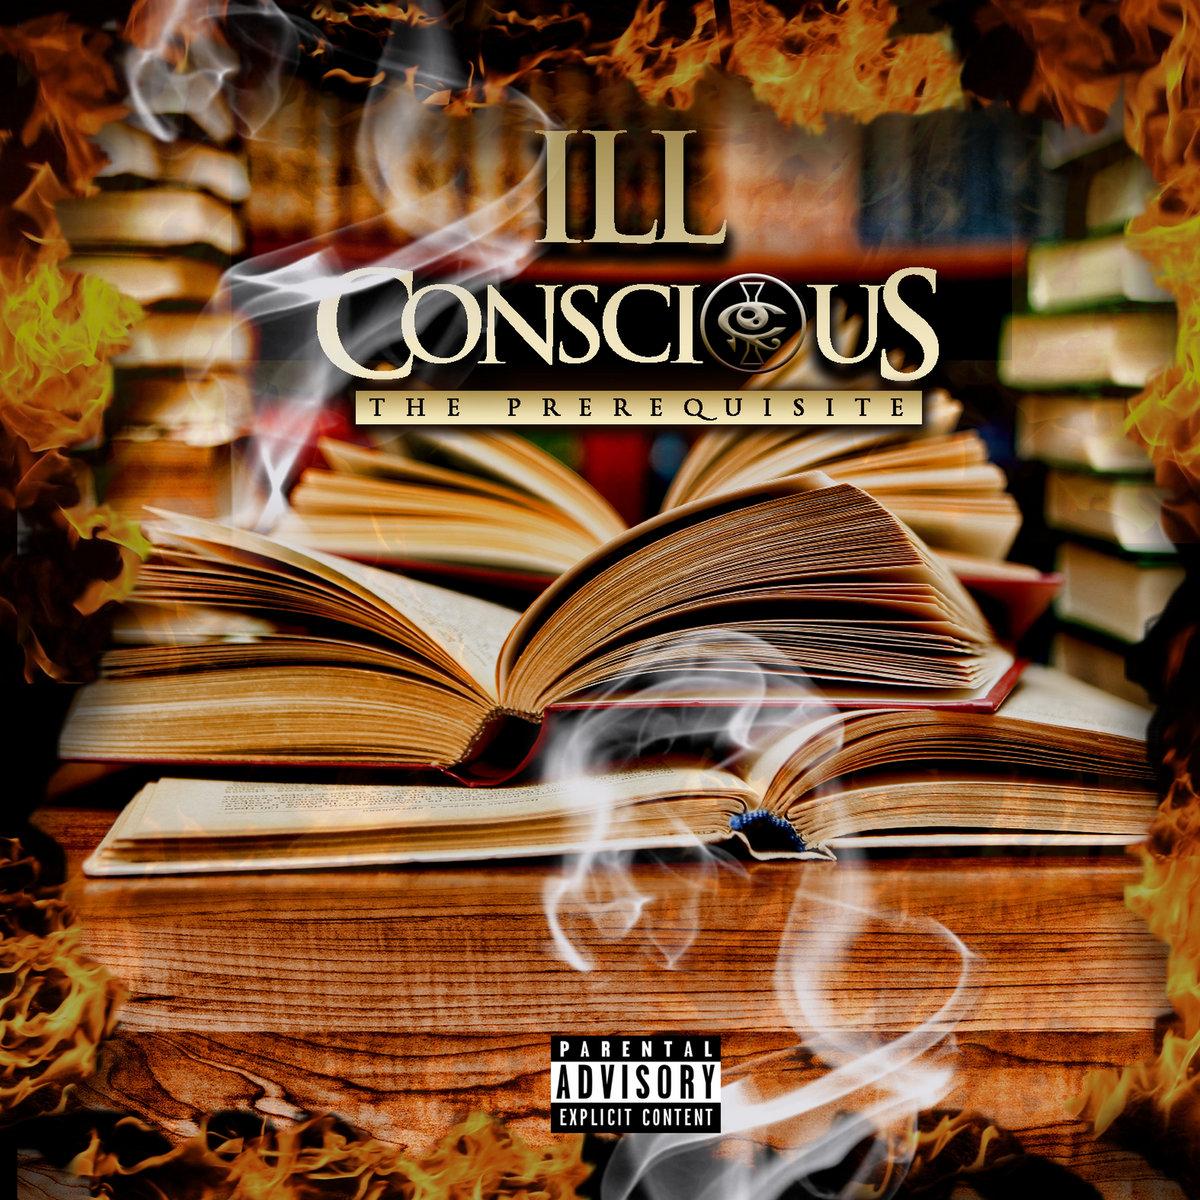 Illconscious_theprerequisite